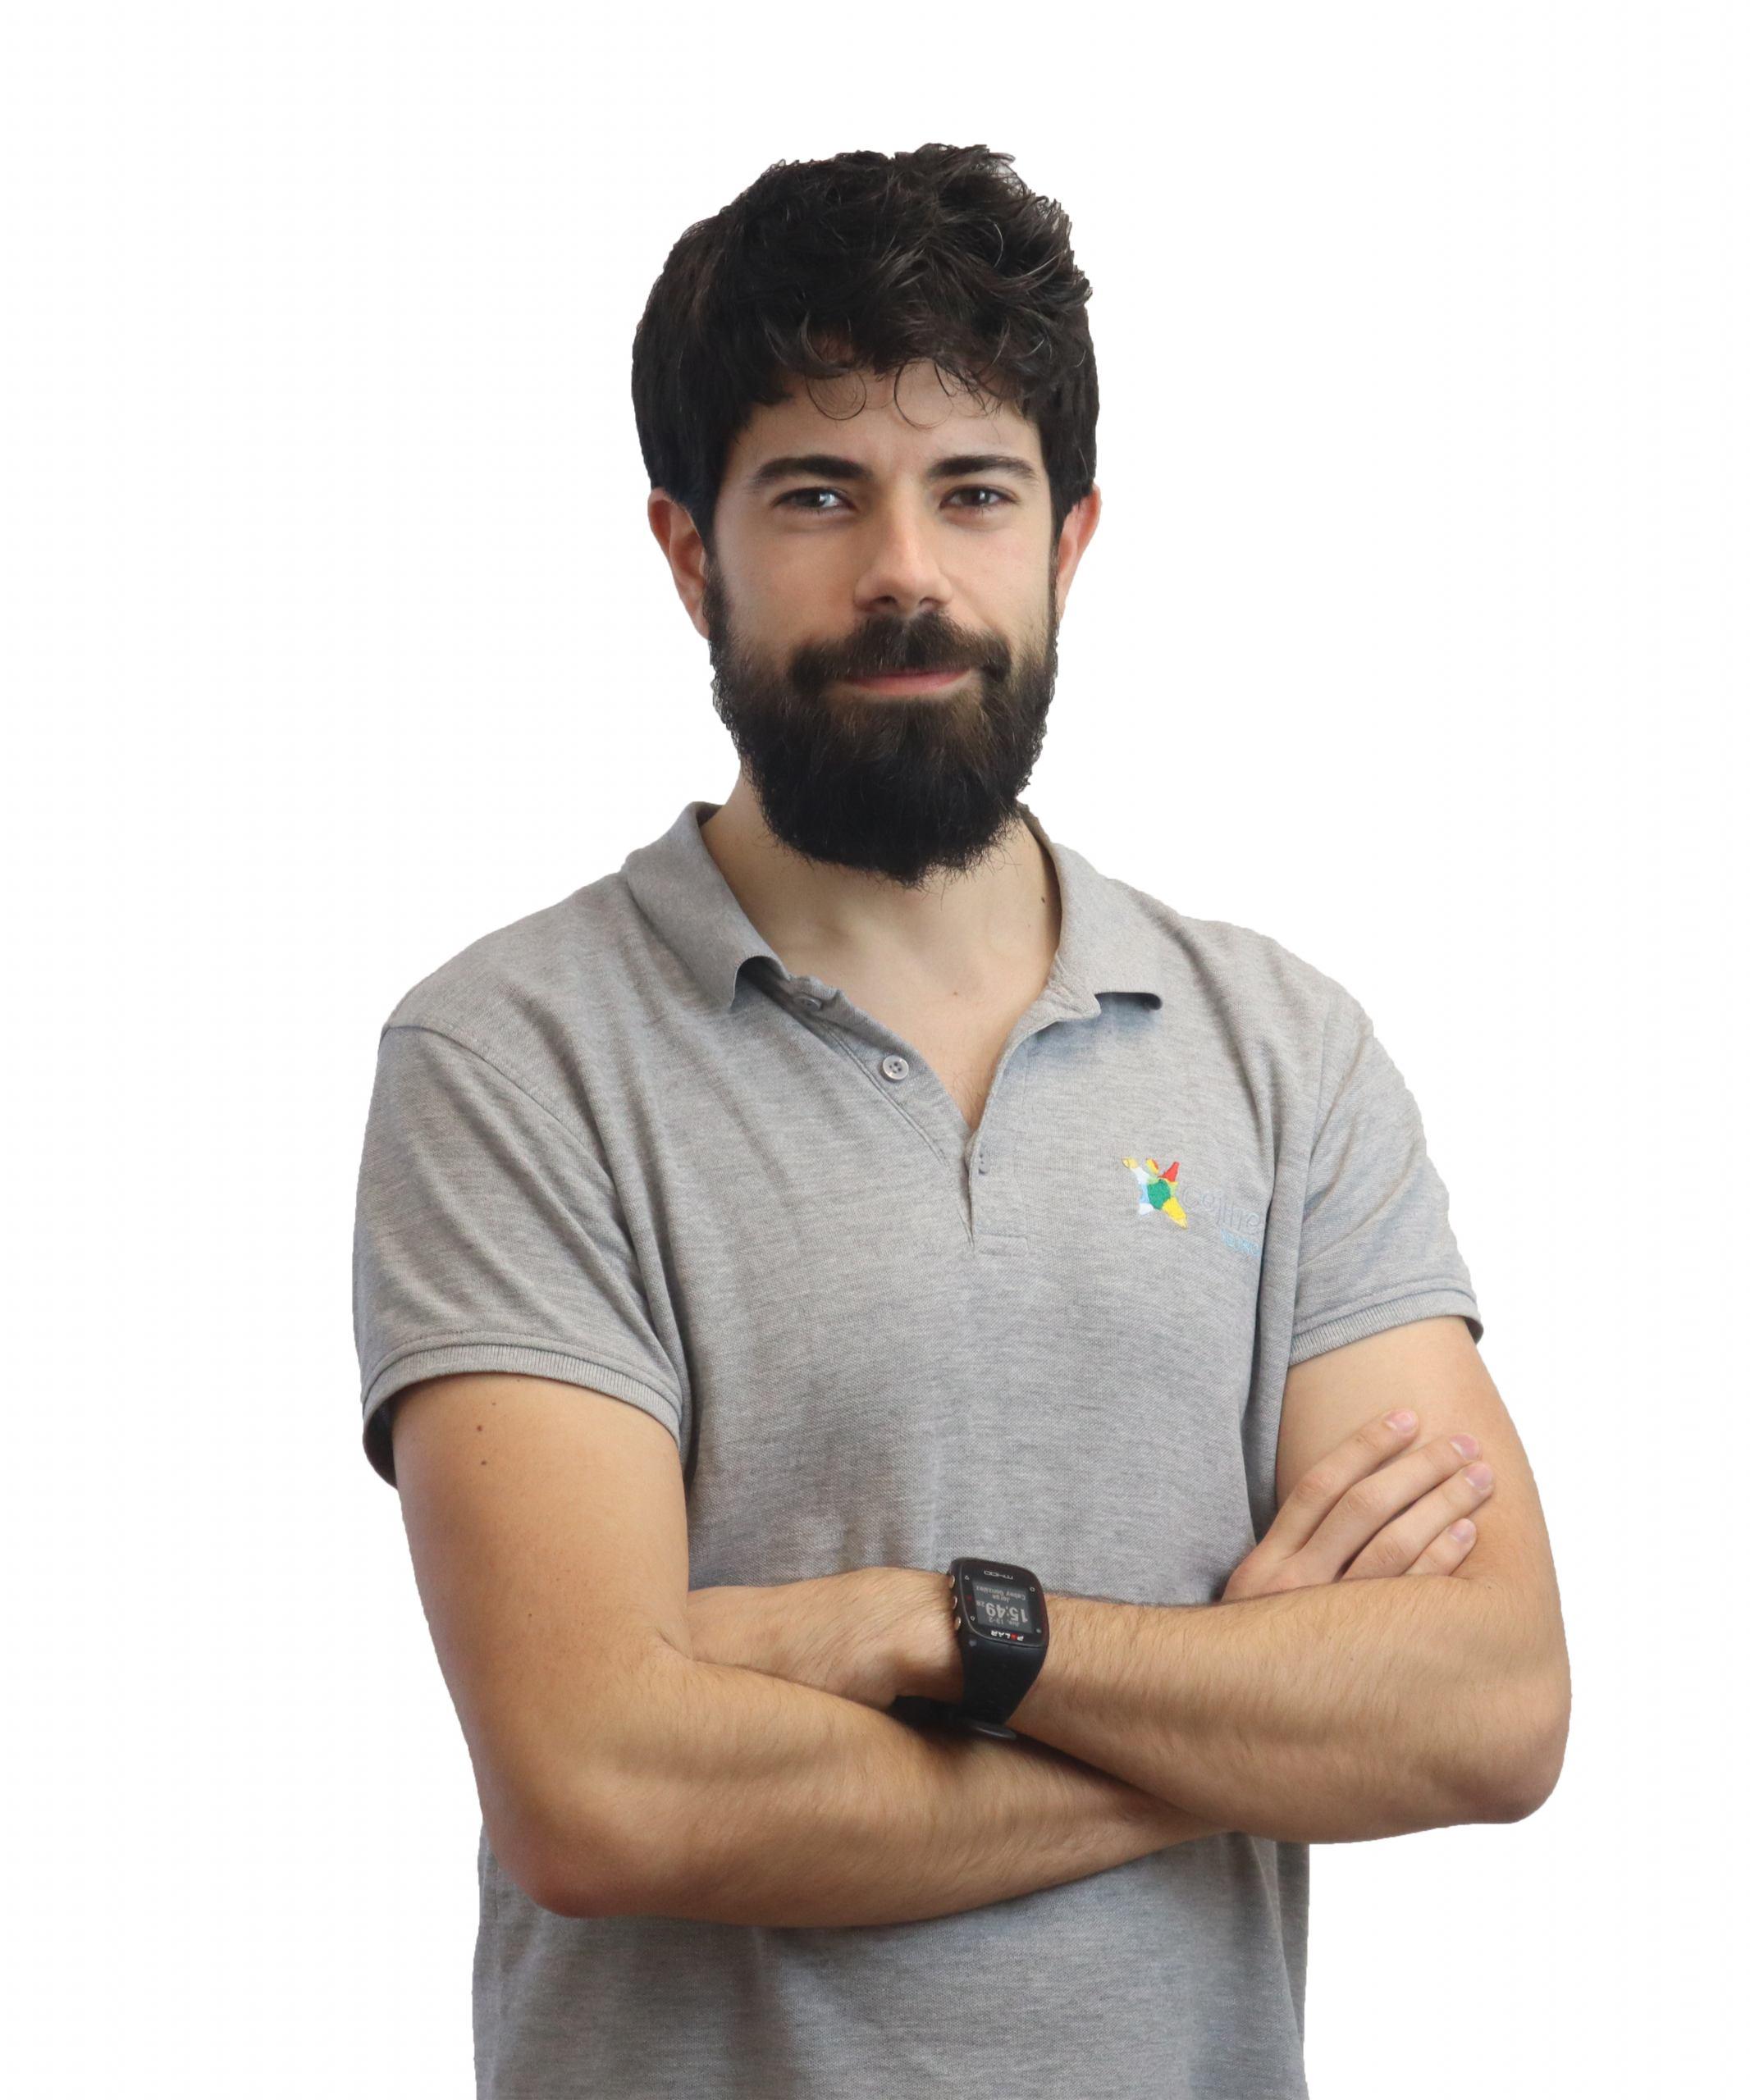 Jorge Cebey